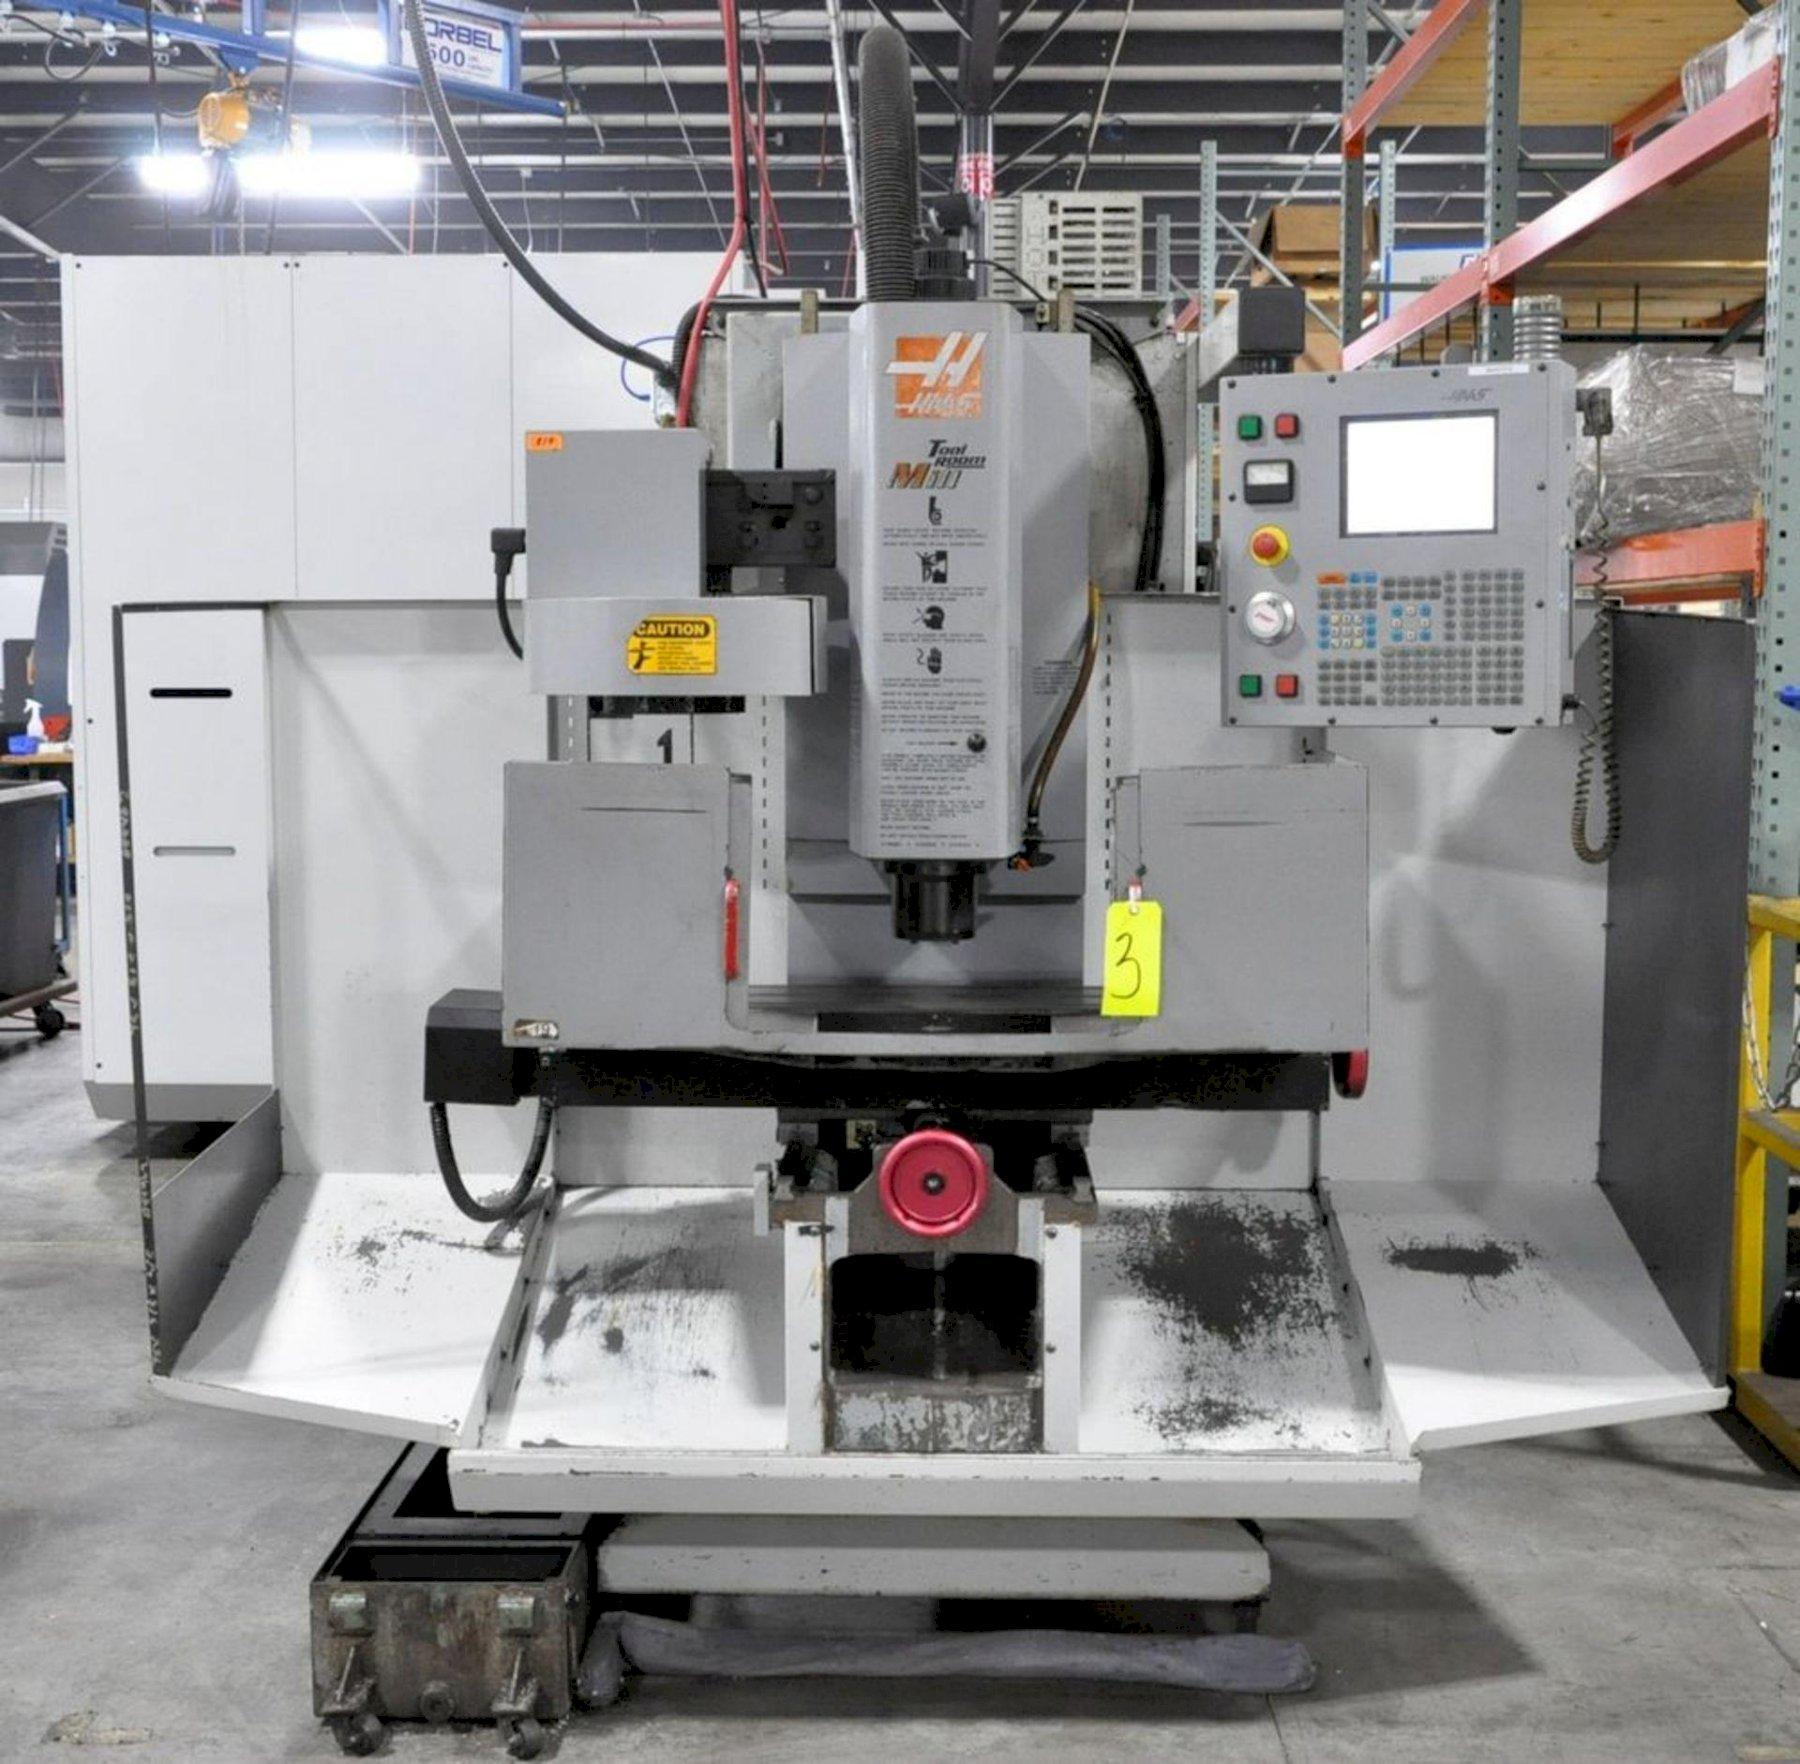 HAAS TM-1 CNC VERTICAL MACHINING CENTER. STOCK # 0633621